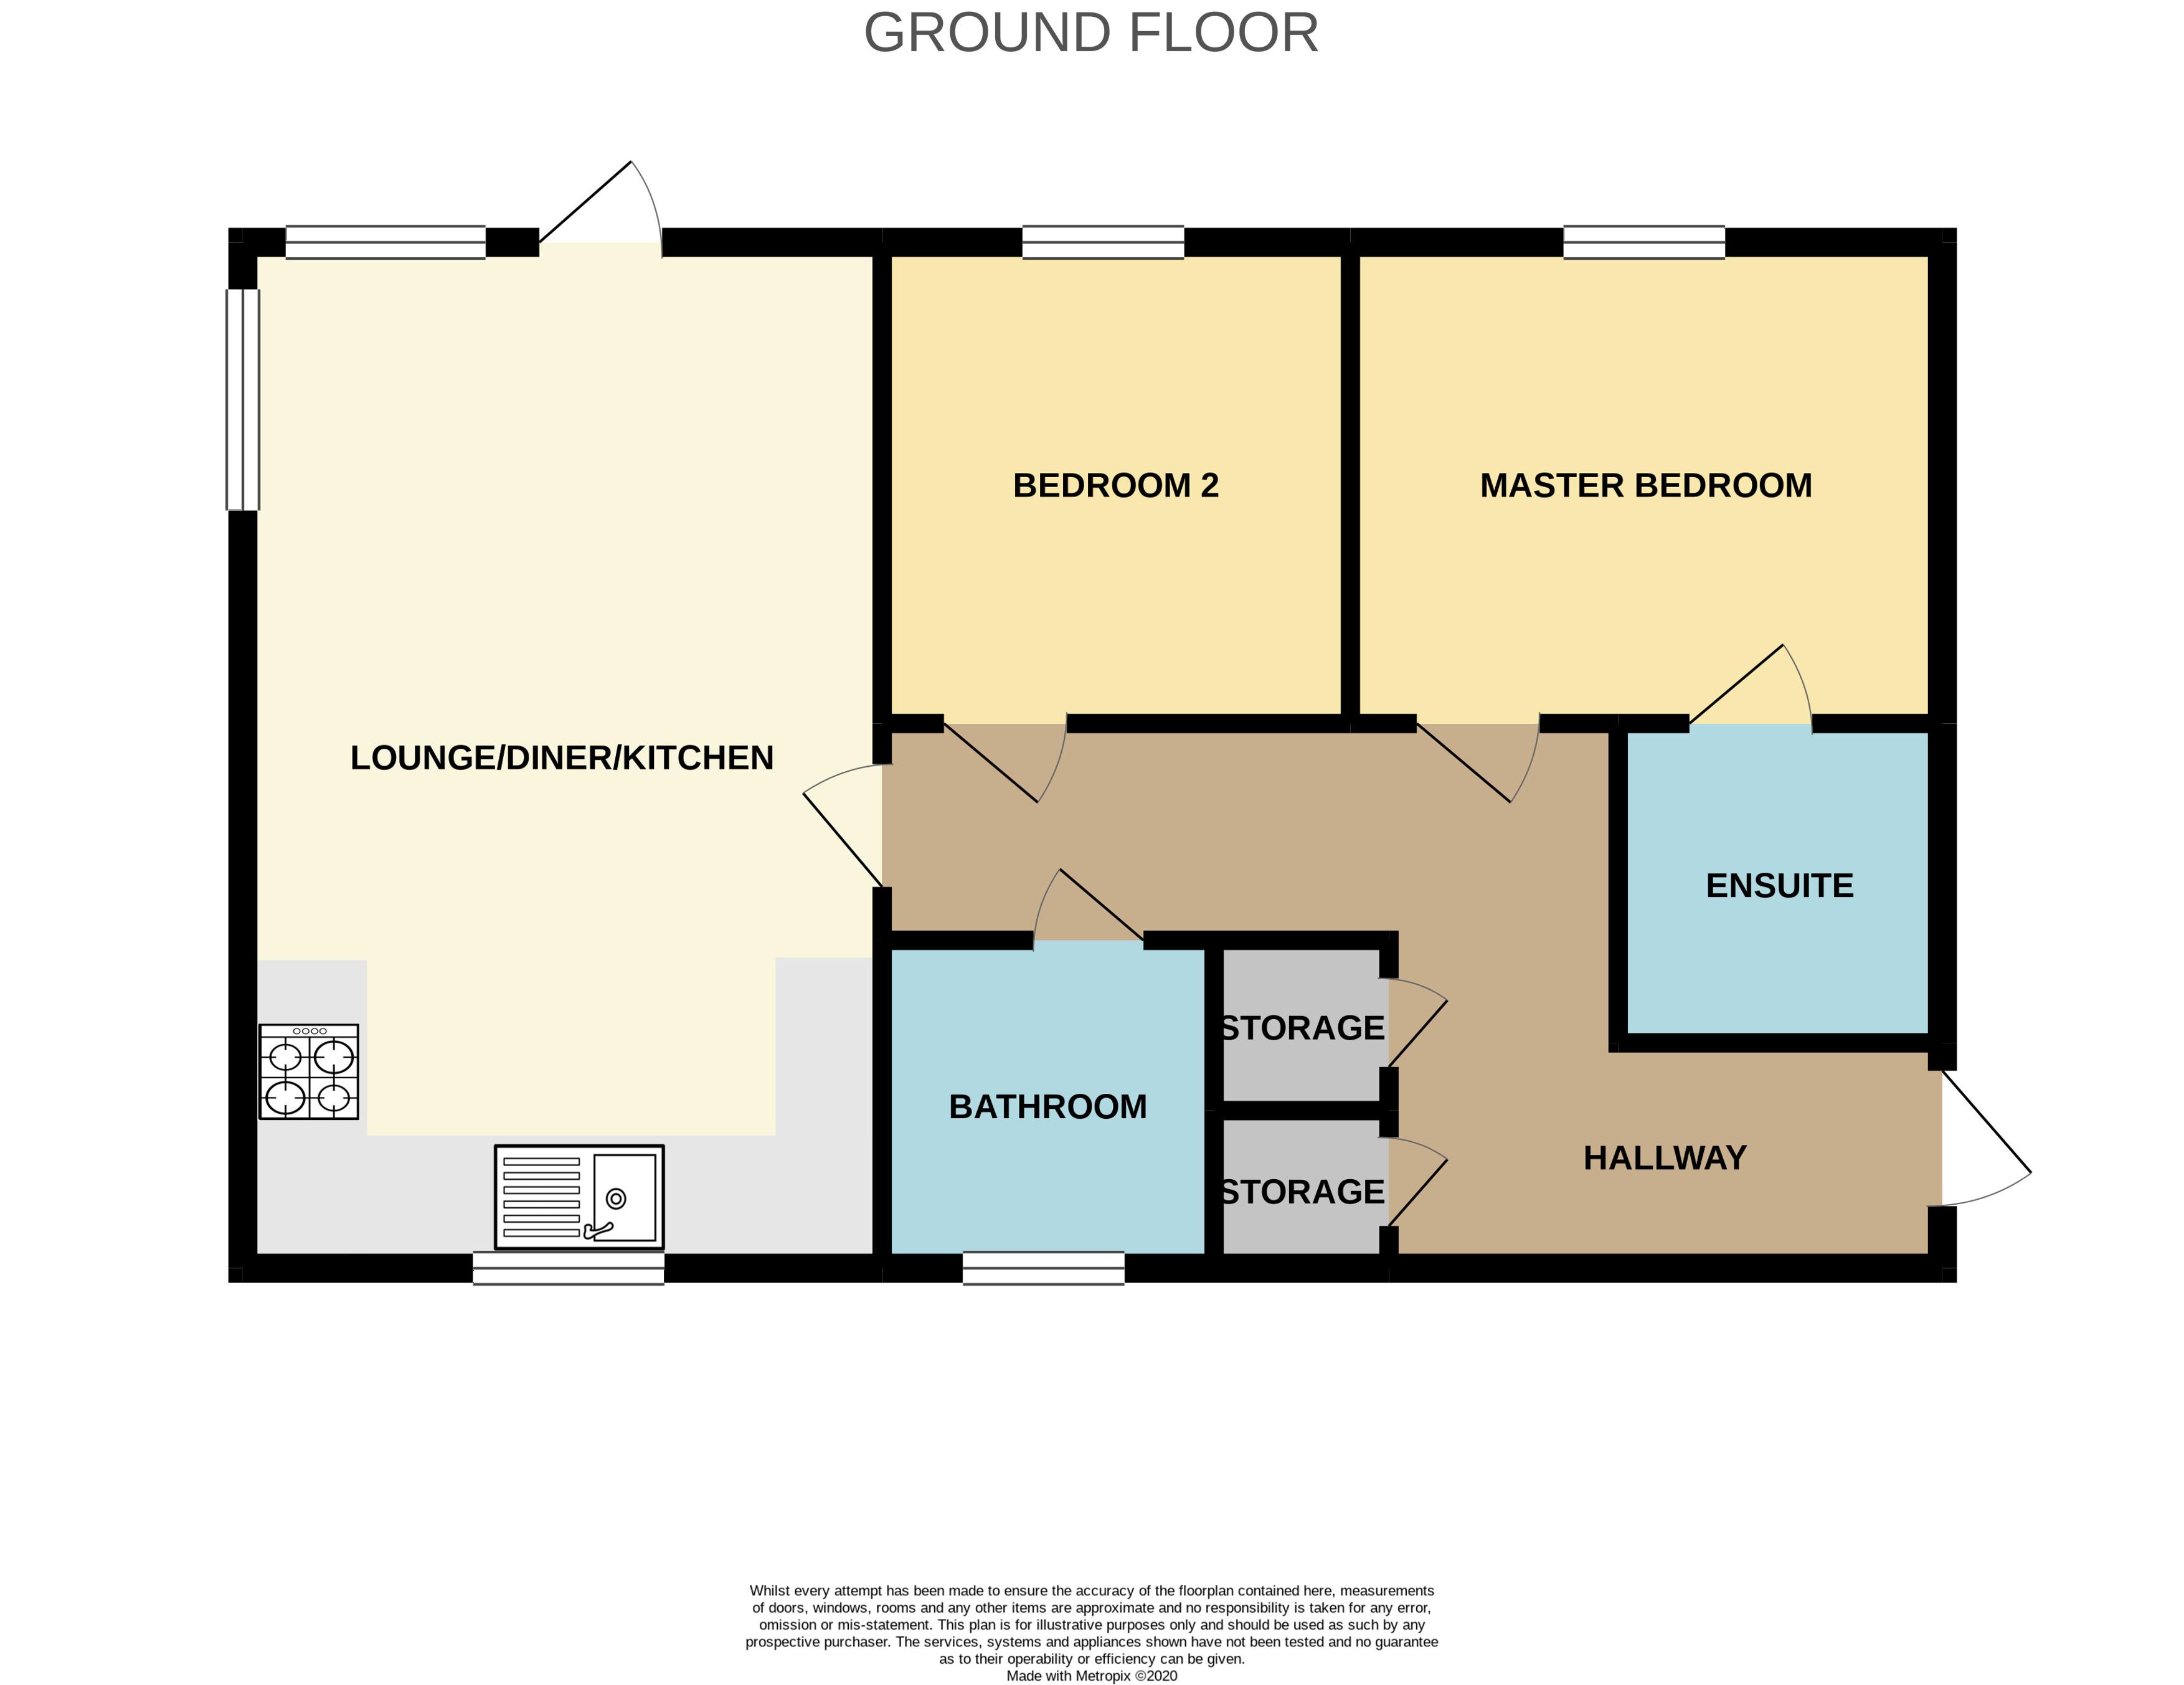 Floorplan for Willowherb Road, Emersons Green.